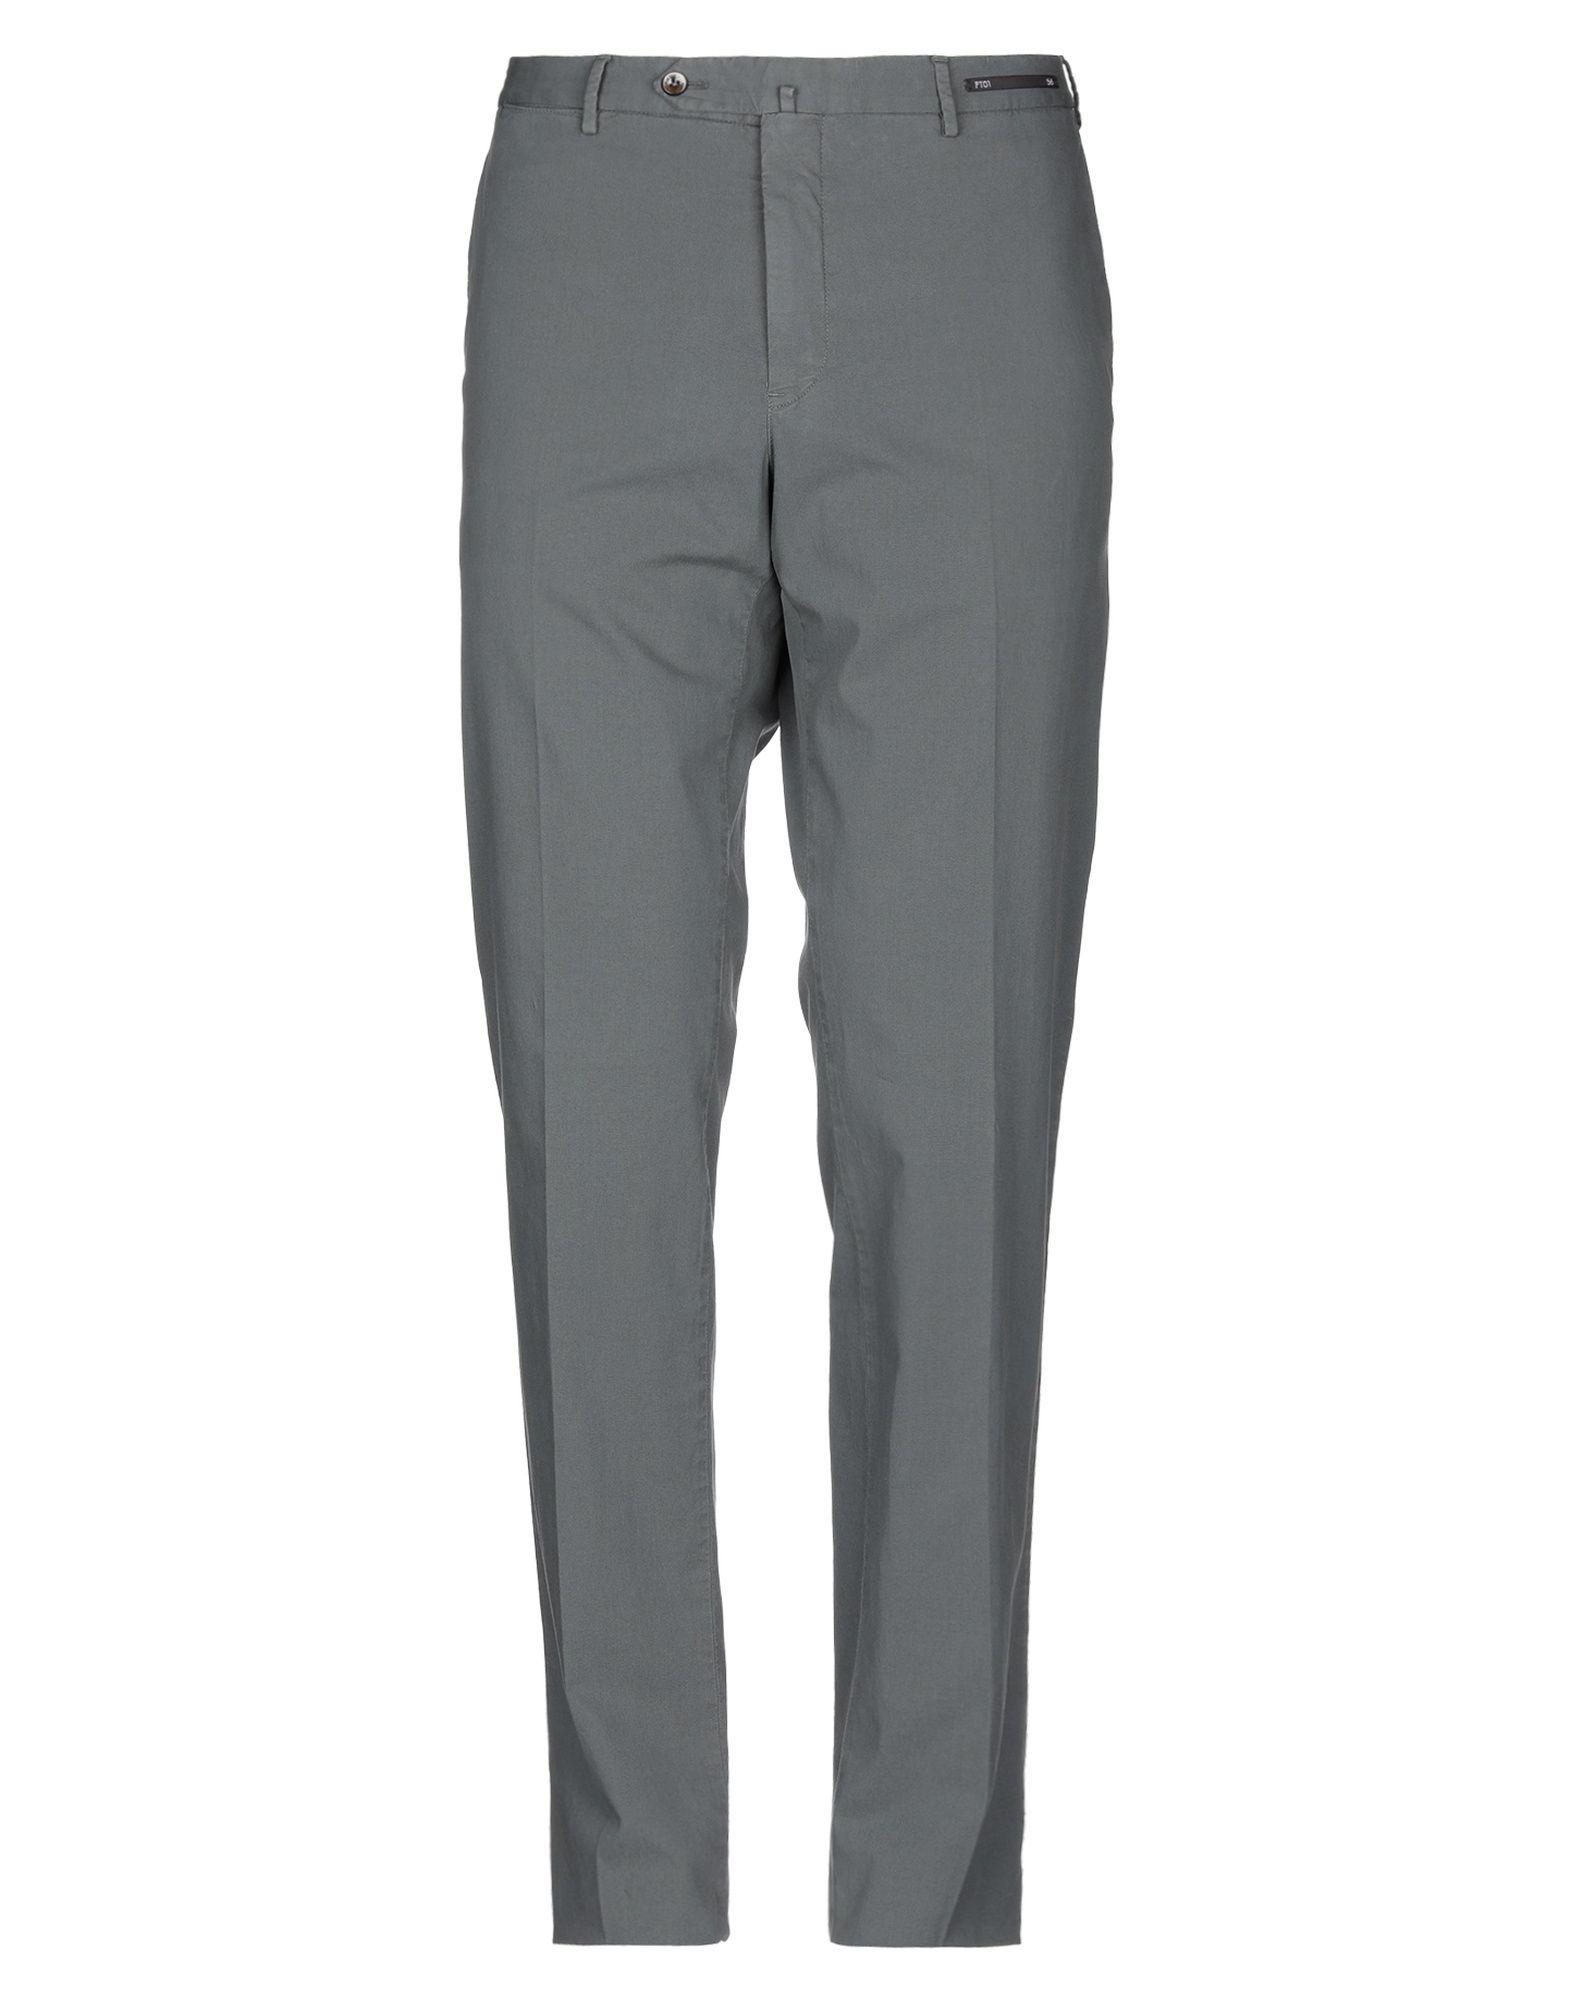 PT01 Повседневные брюки брюки чинос quelle quelle 920895